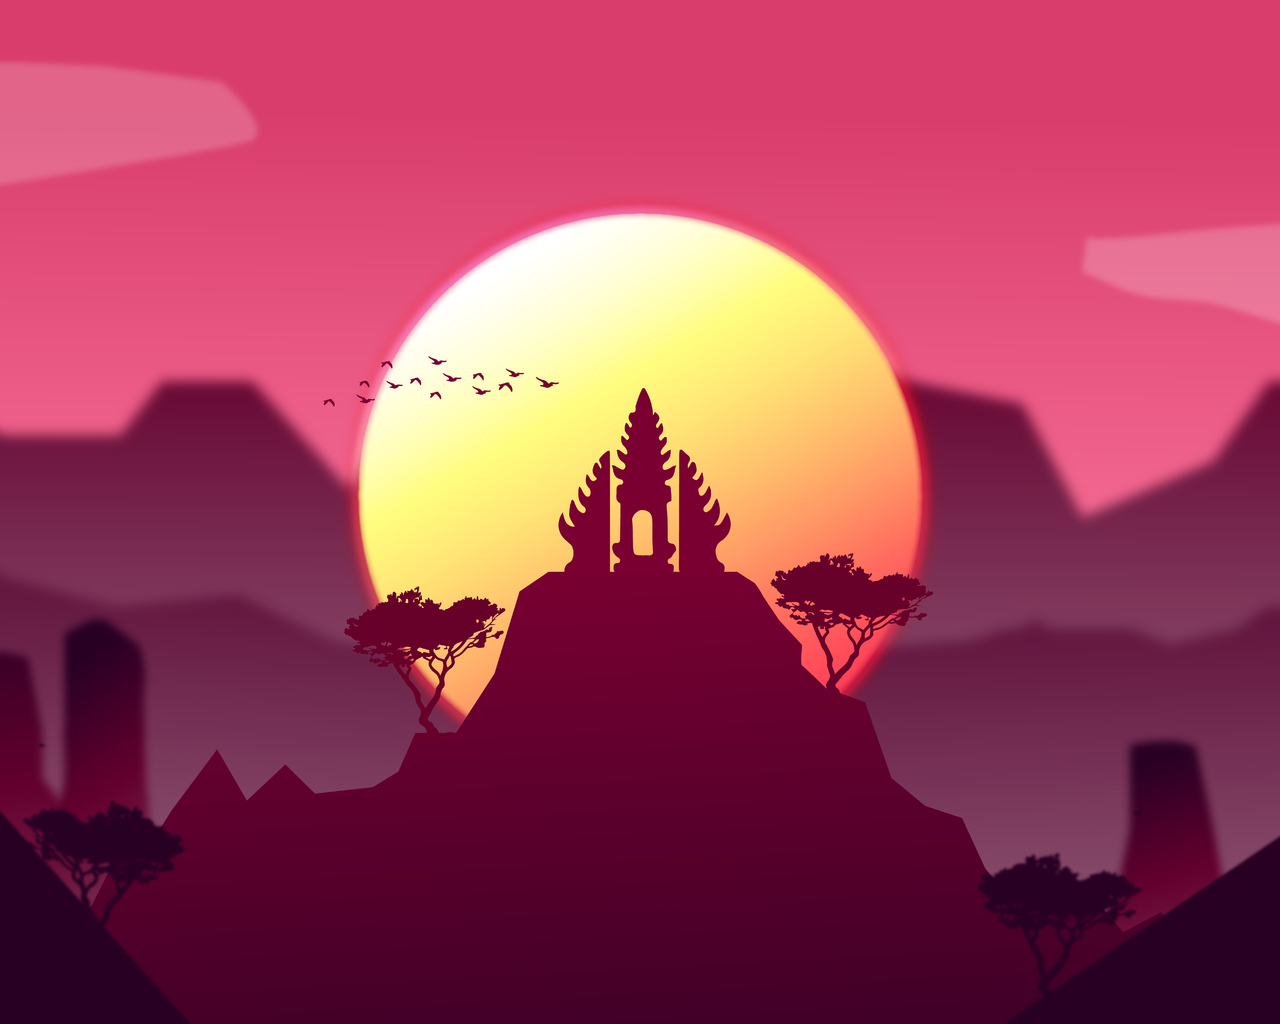 sunset-on-a-temple-10k-4v.jpg